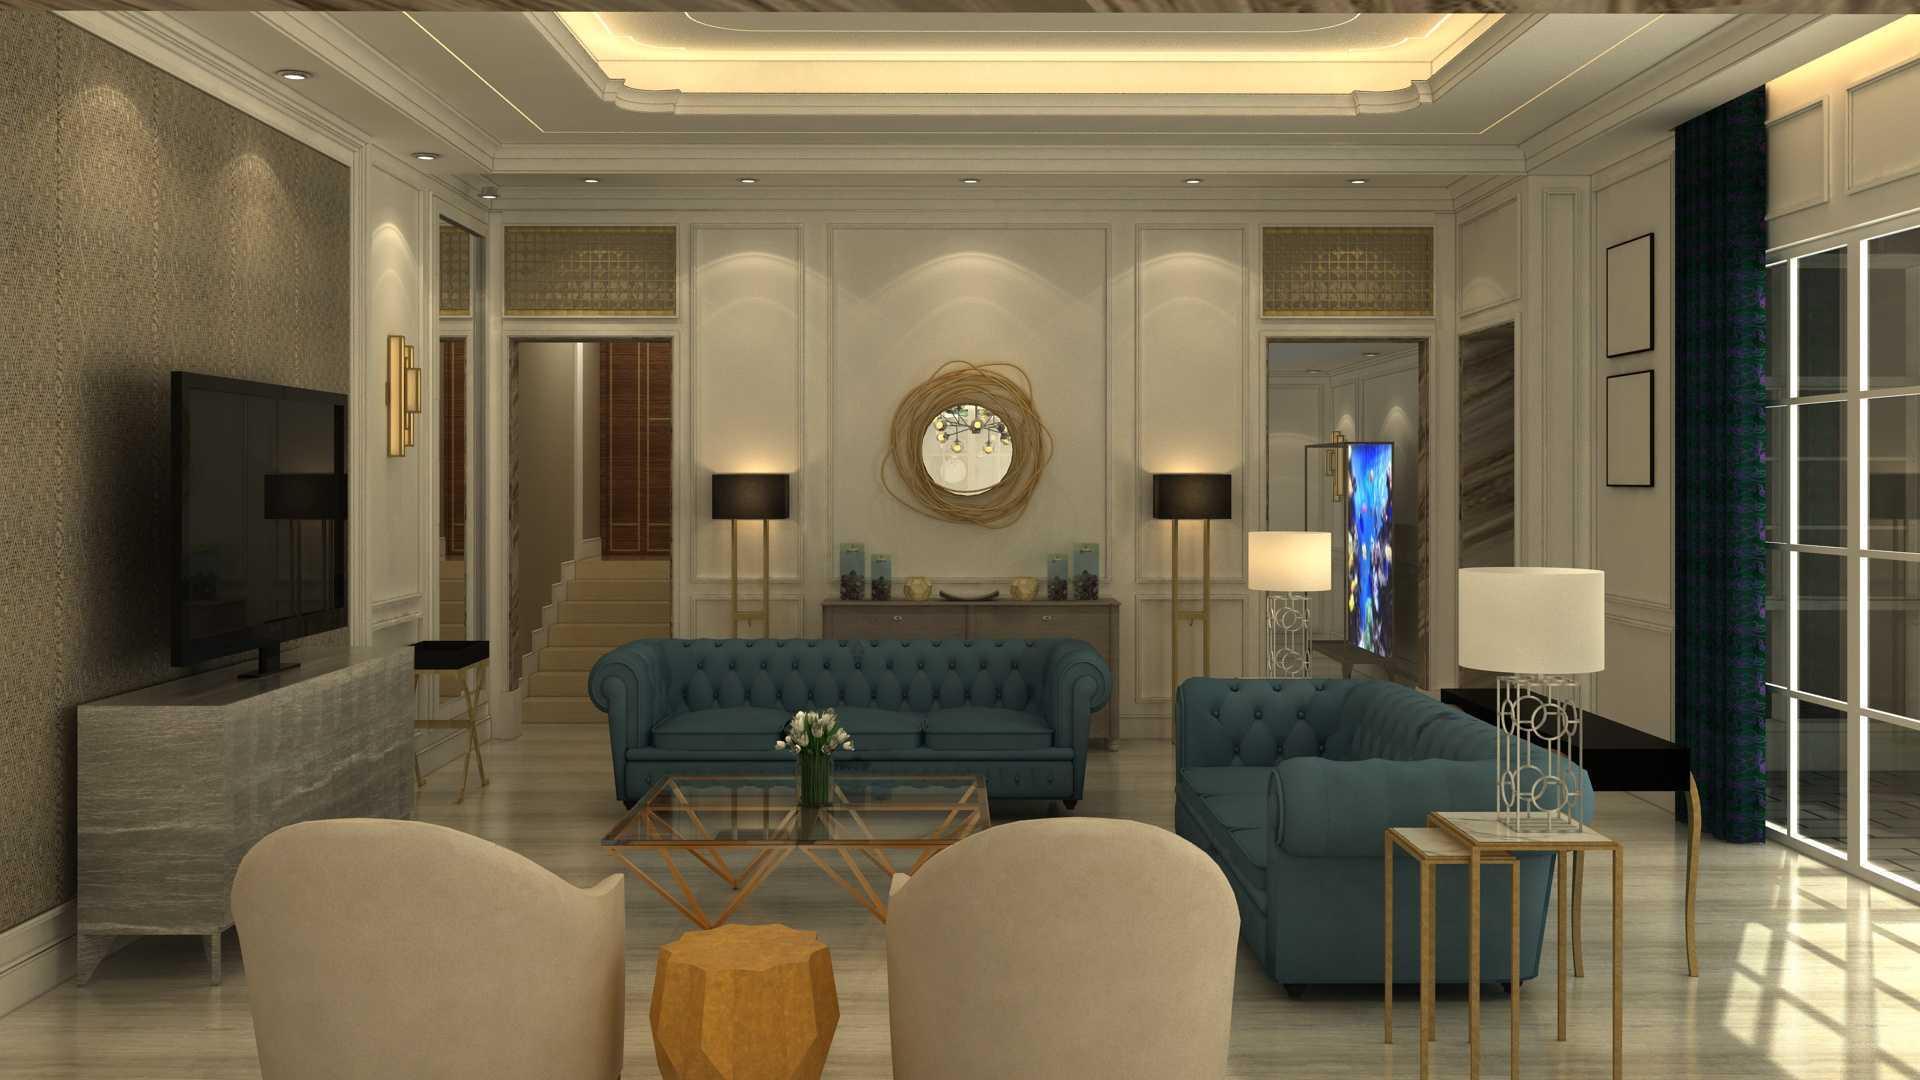 Vin•da•te Residence @ Semarang Semarang - Indonesia Semarang - Indonesia Livingroom Kontemporer  17630